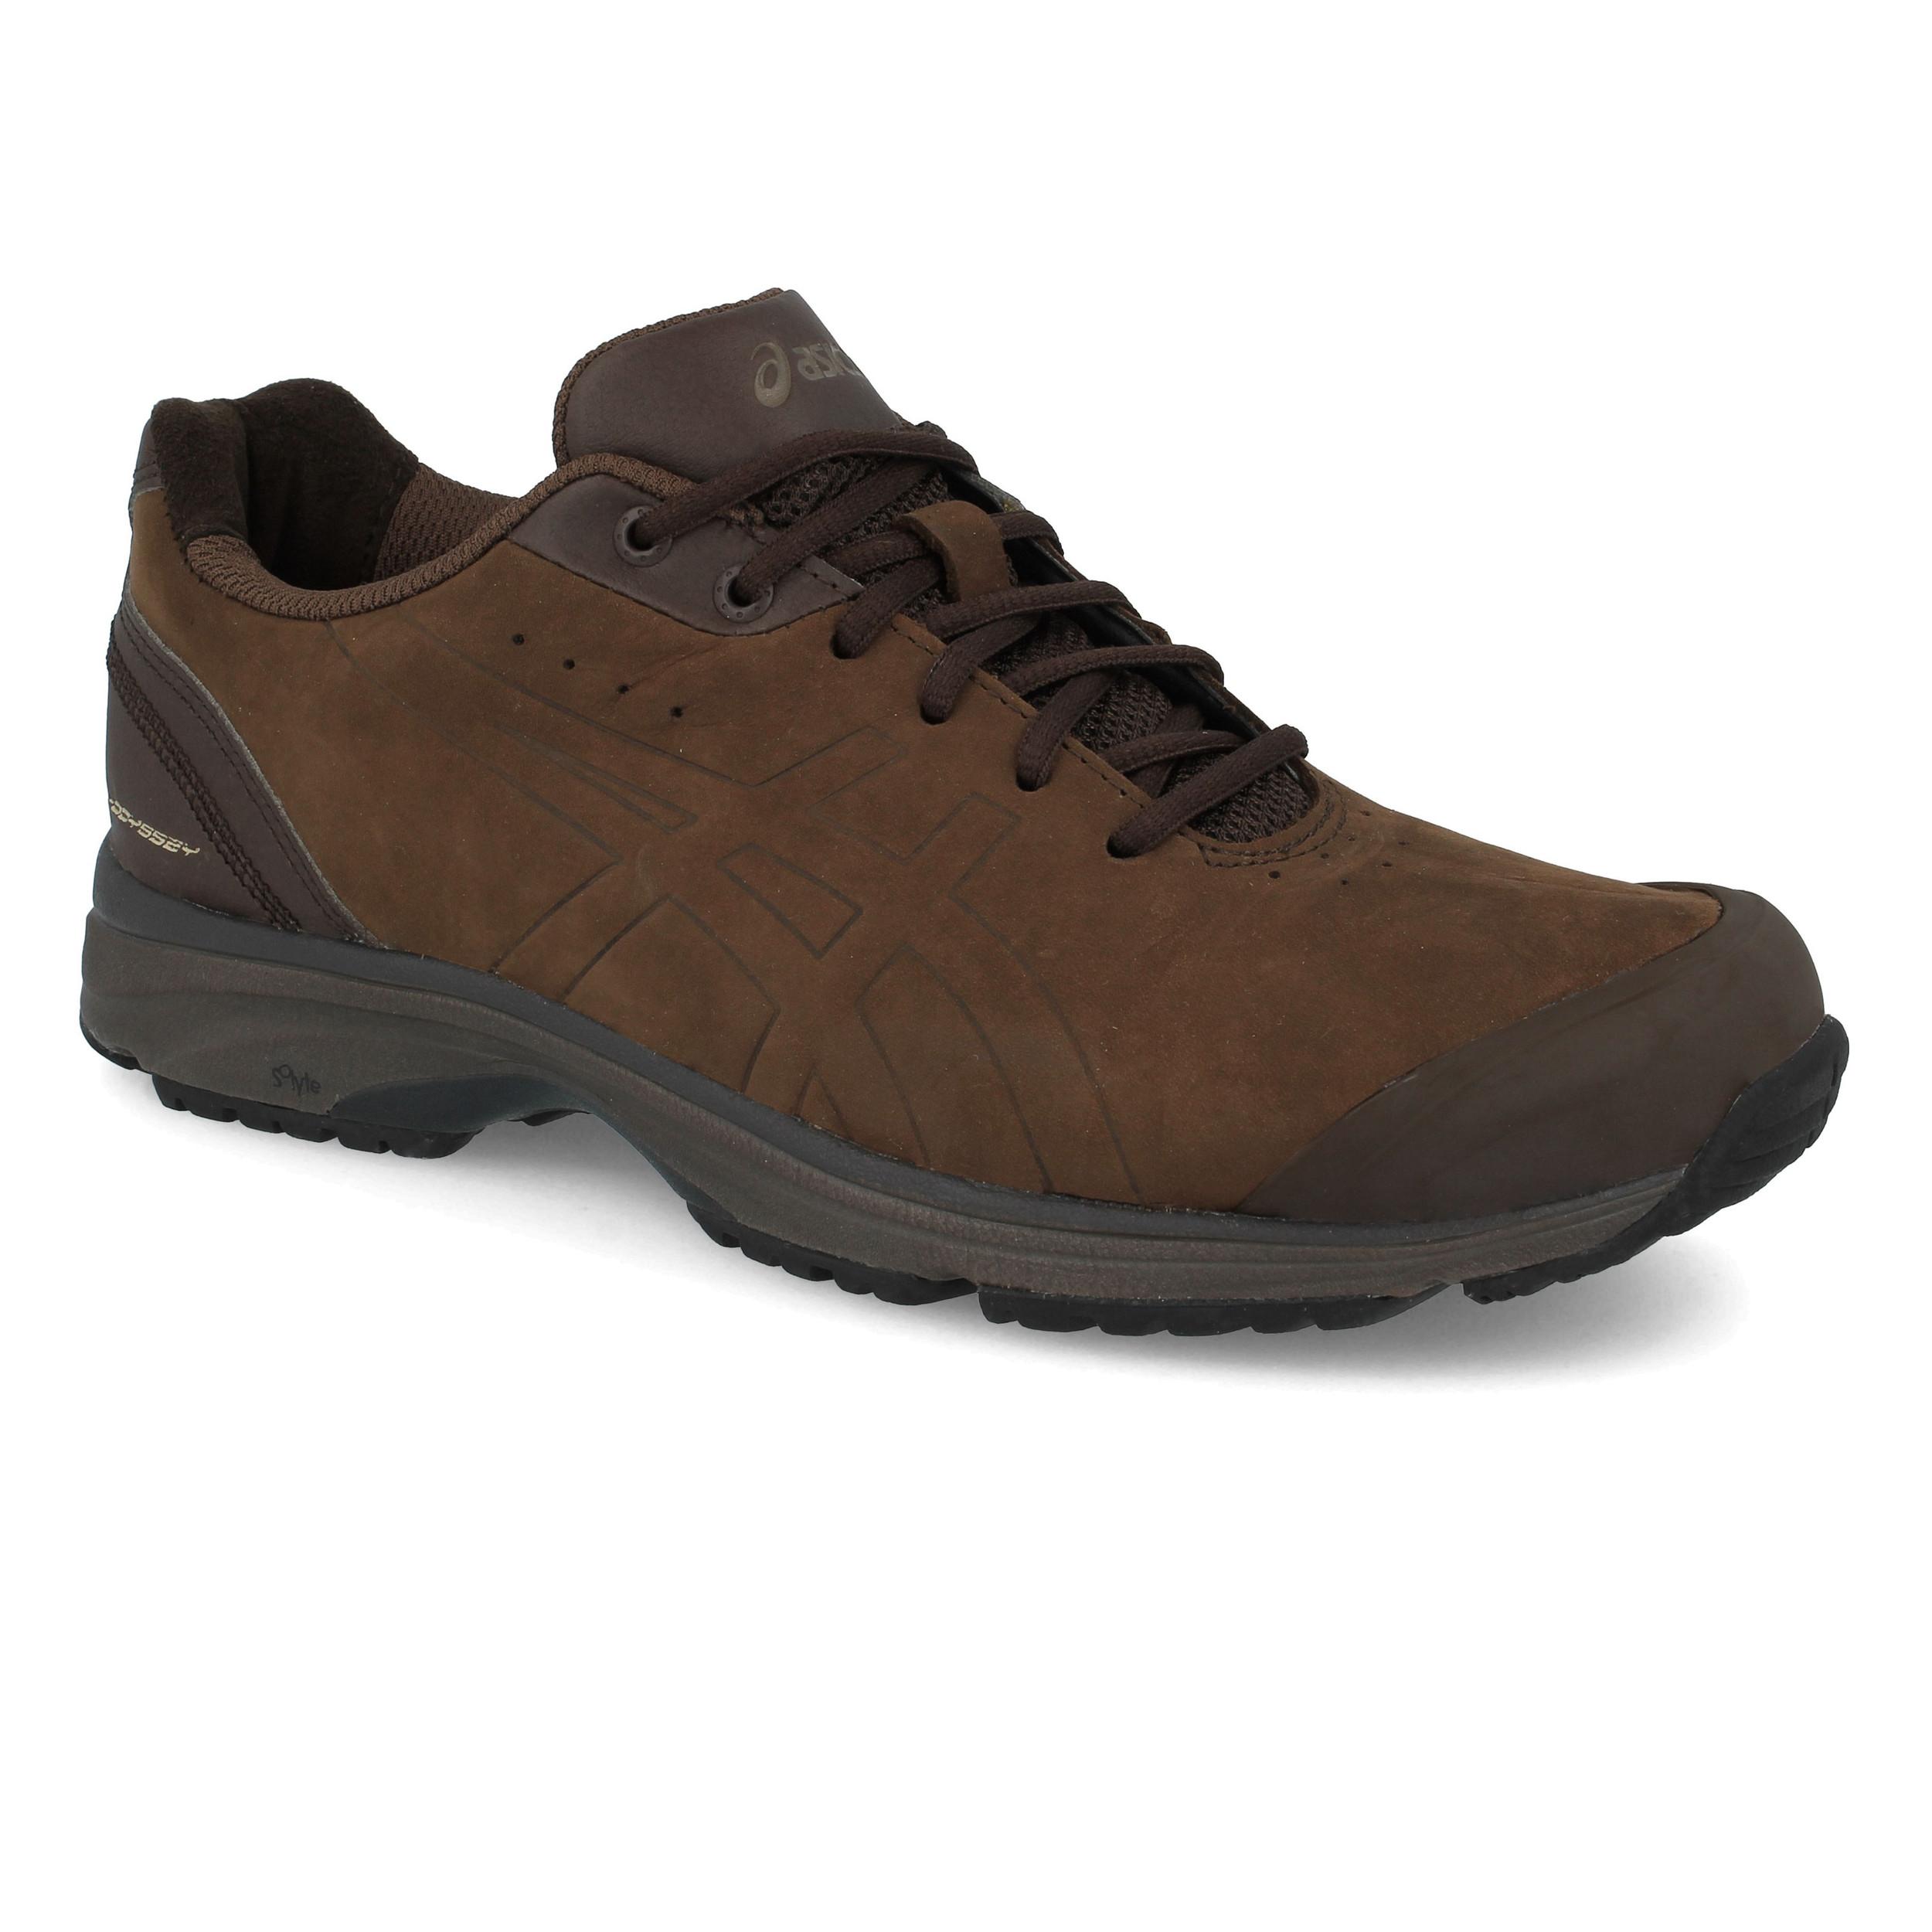 72d37385dbe Asics Mujer Gel-odyssey Wr Caminar Zapatos Marrón Deporte Resistente al Agua